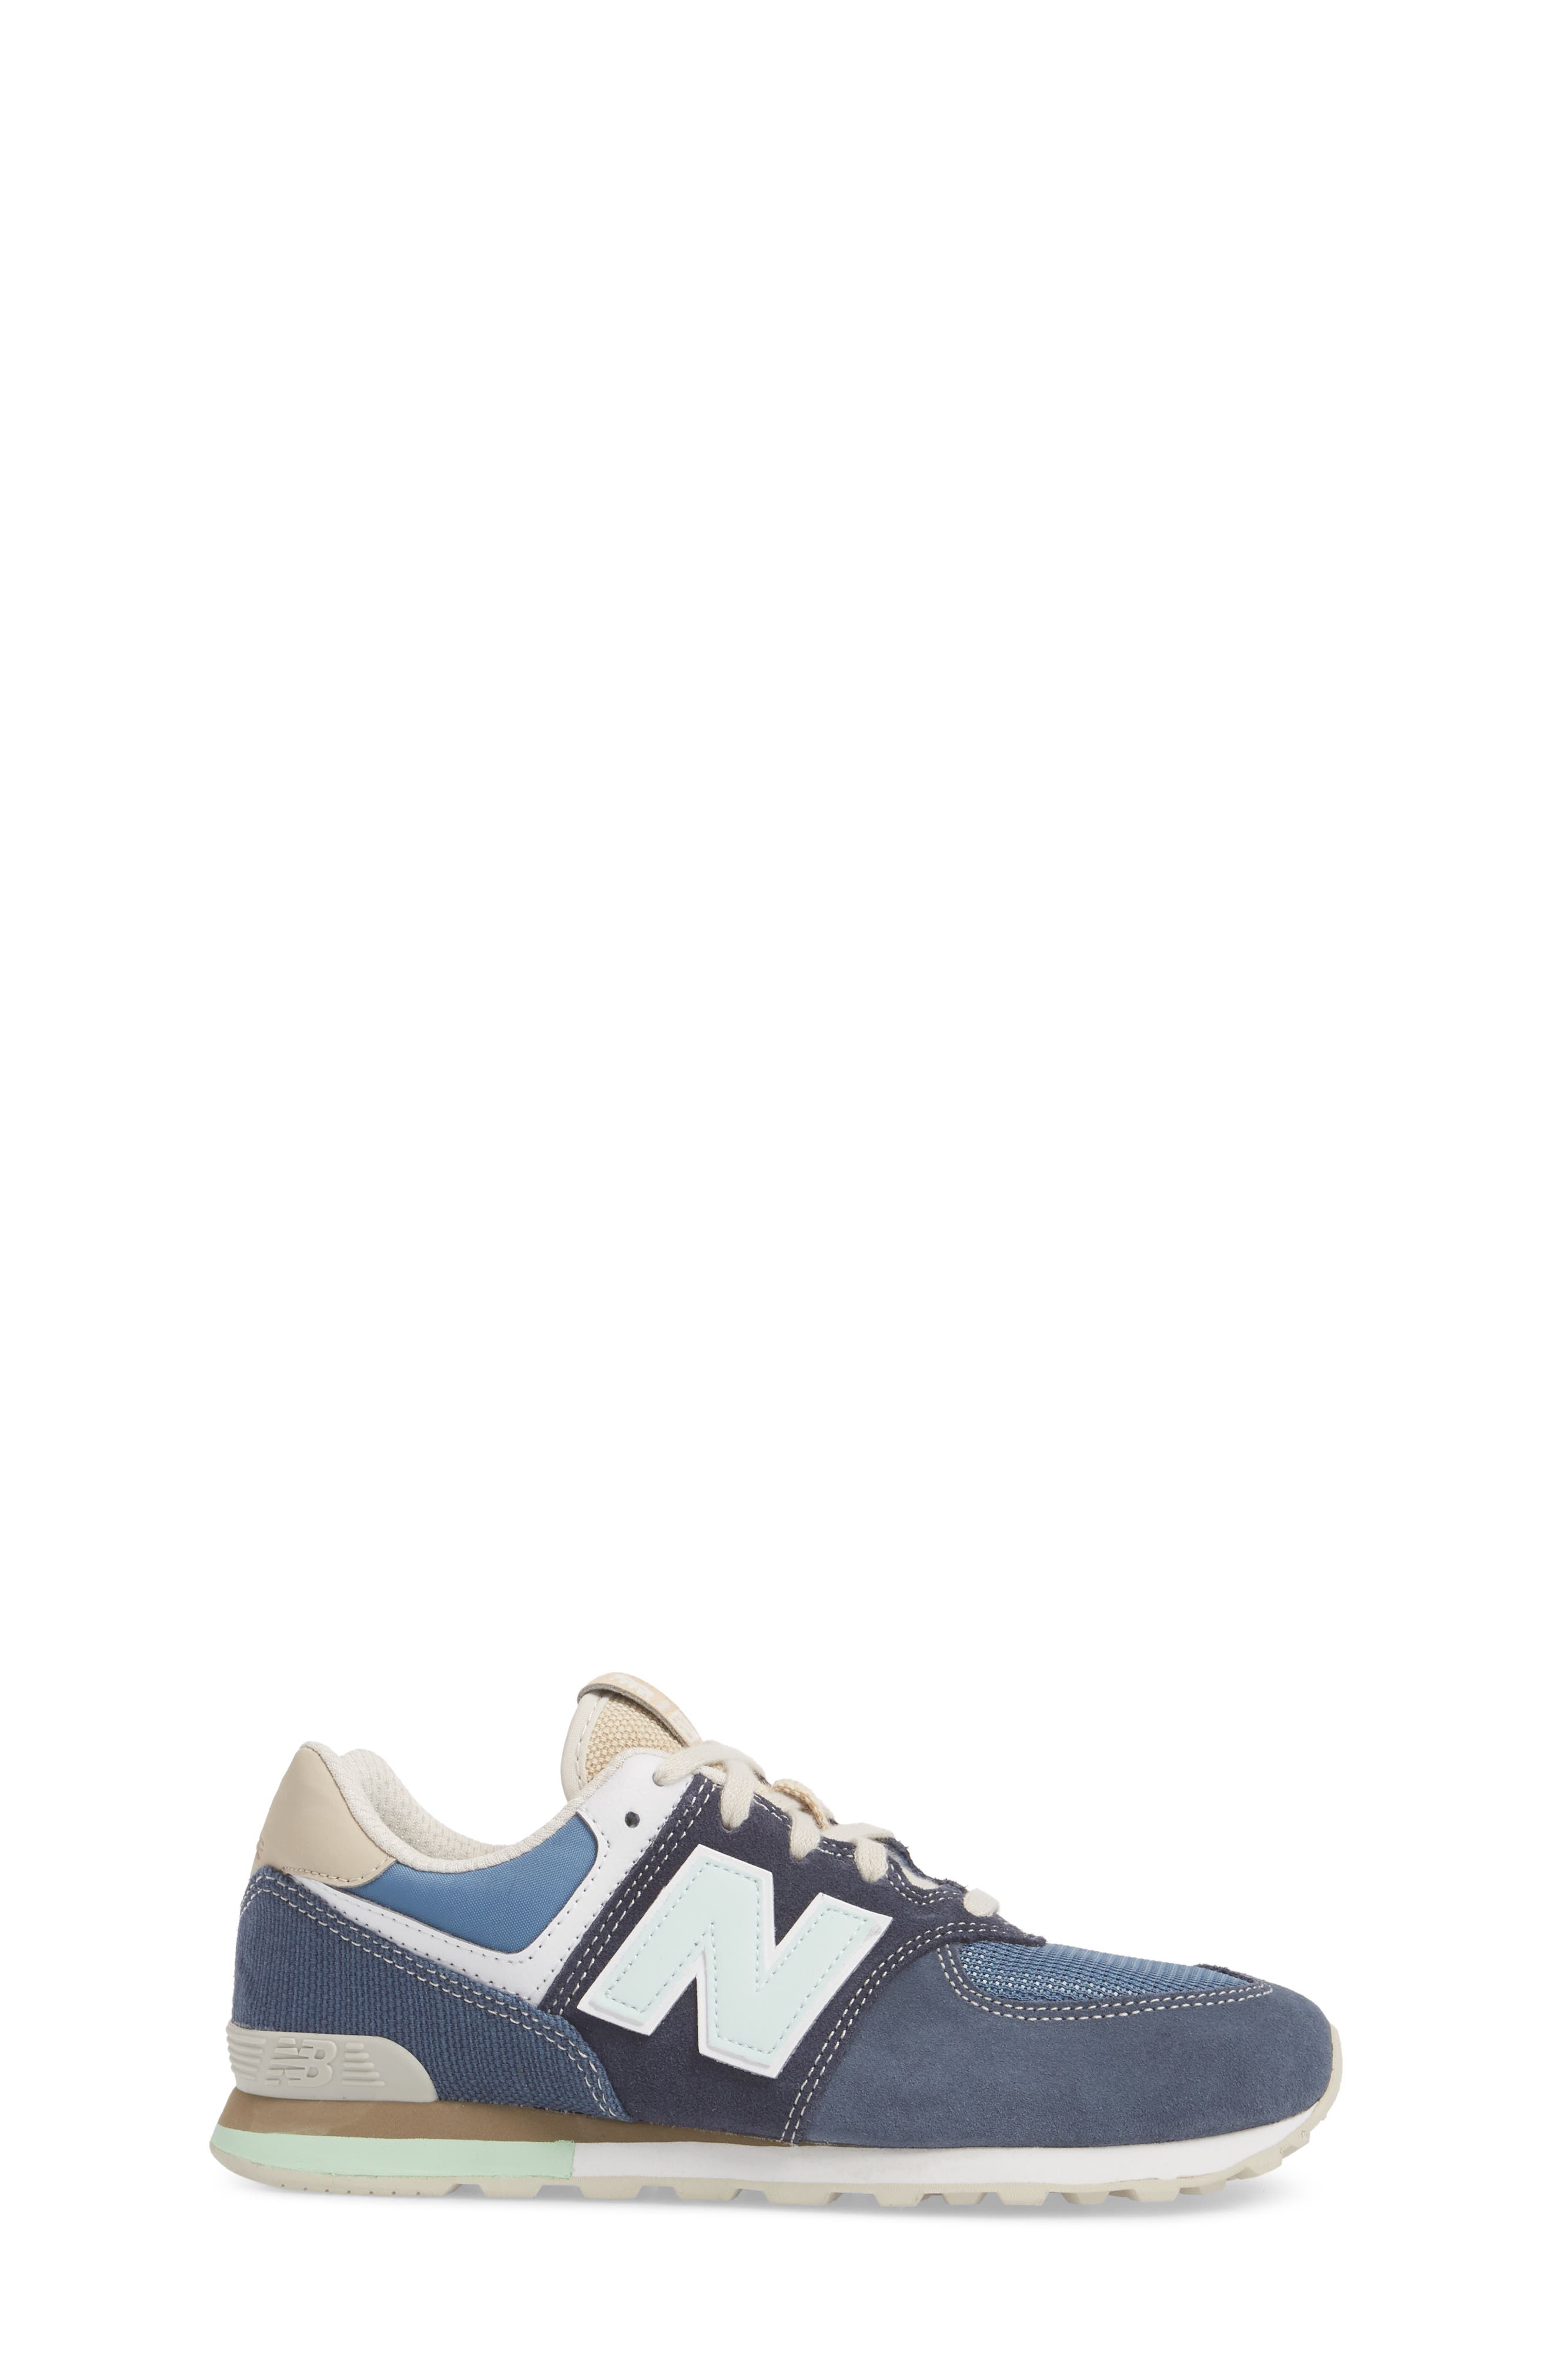 574 Retro Surf Sneaker,                             Alternate thumbnail 3, color,                             410